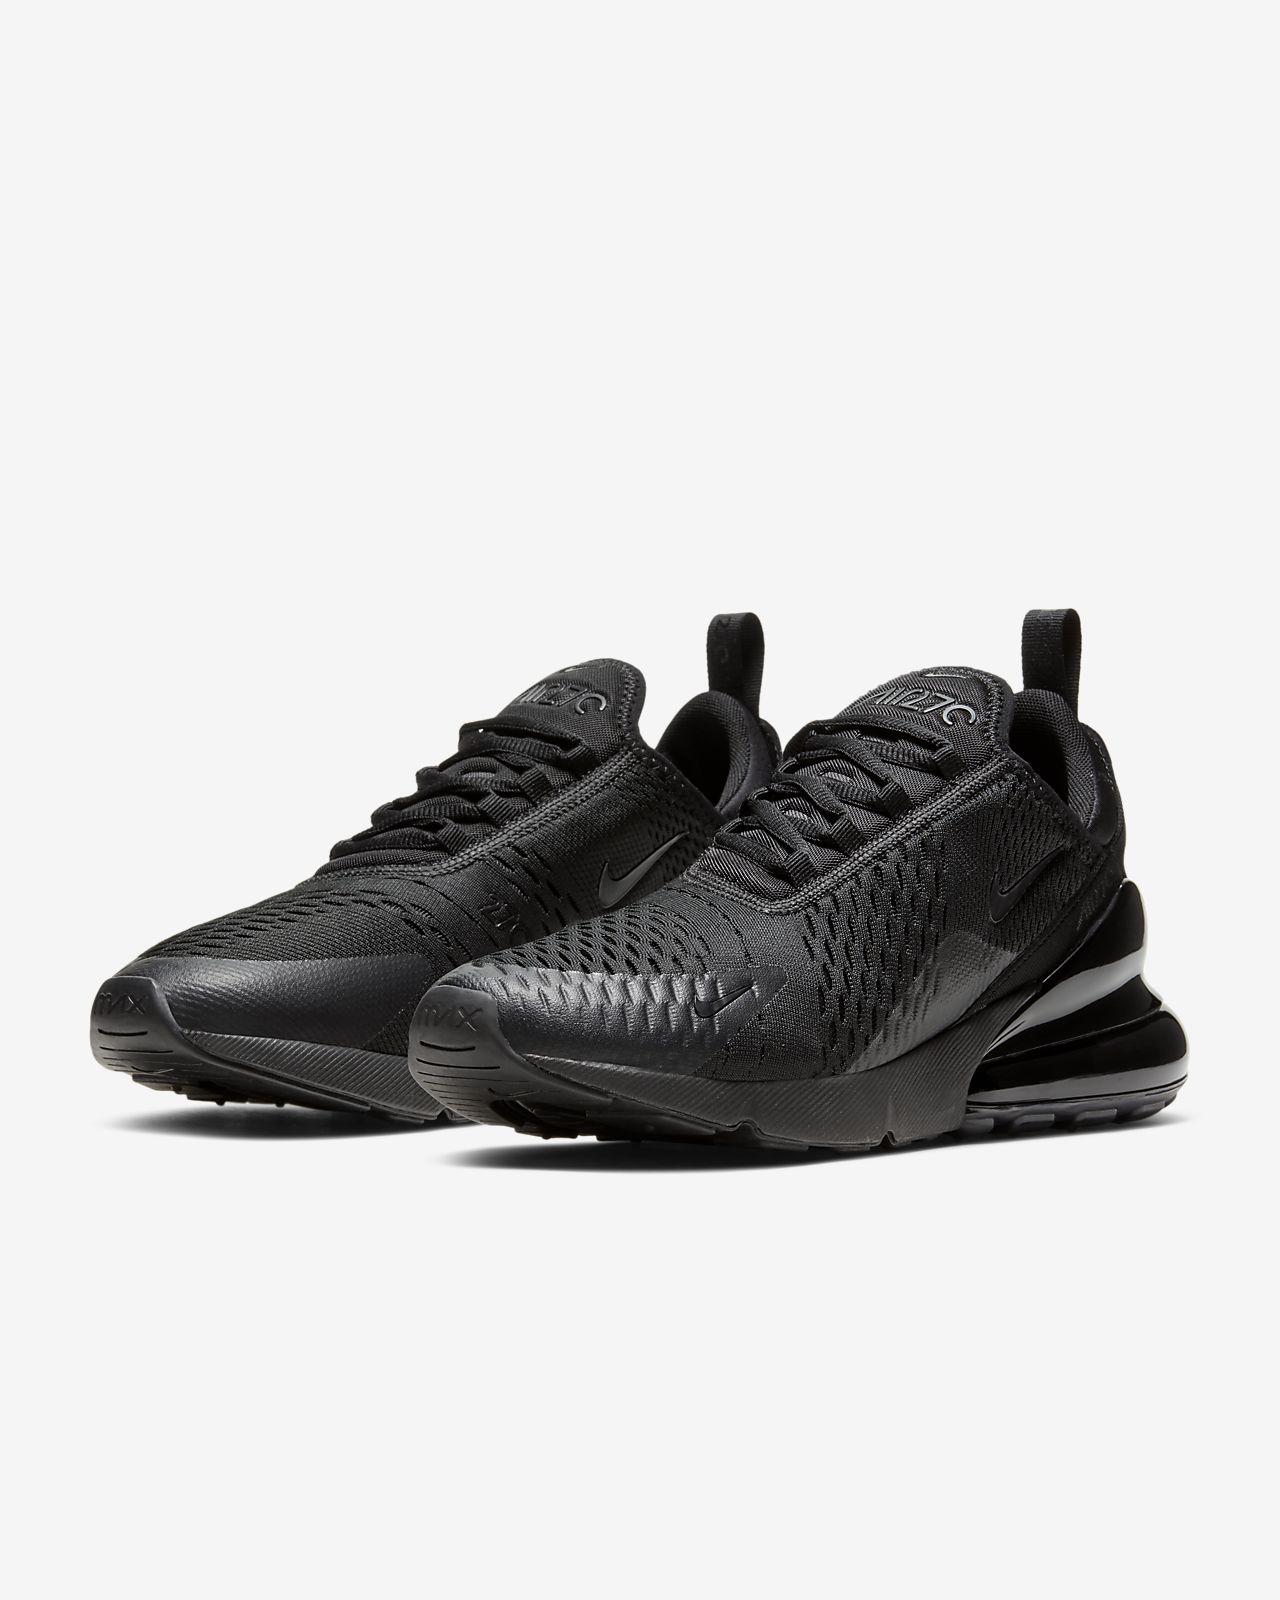 65b7a50544 Nike Air Max 270 Erkek Ayakkabısı. Nike.com TR